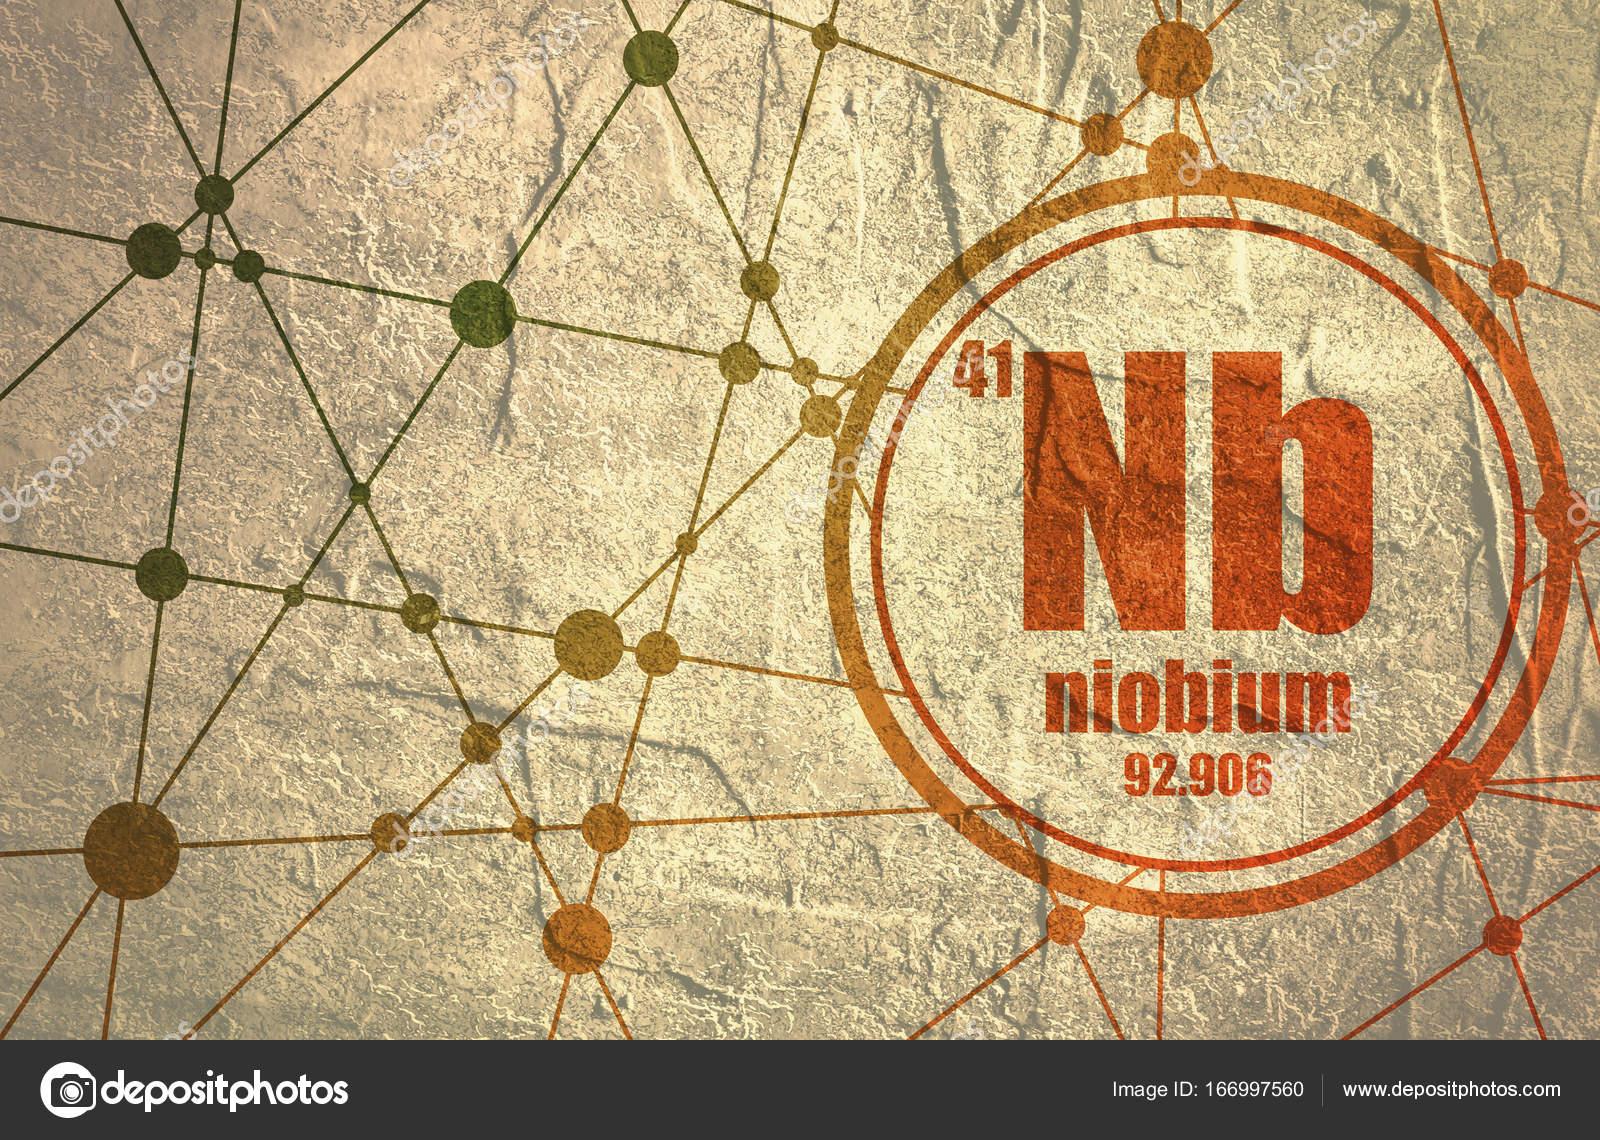 Niobium chemical element stock photo jegasra 166997560 niobium chemical element sign with atomic number and atomic weight chemical element of periodic table molecule and communication background biocorpaavc